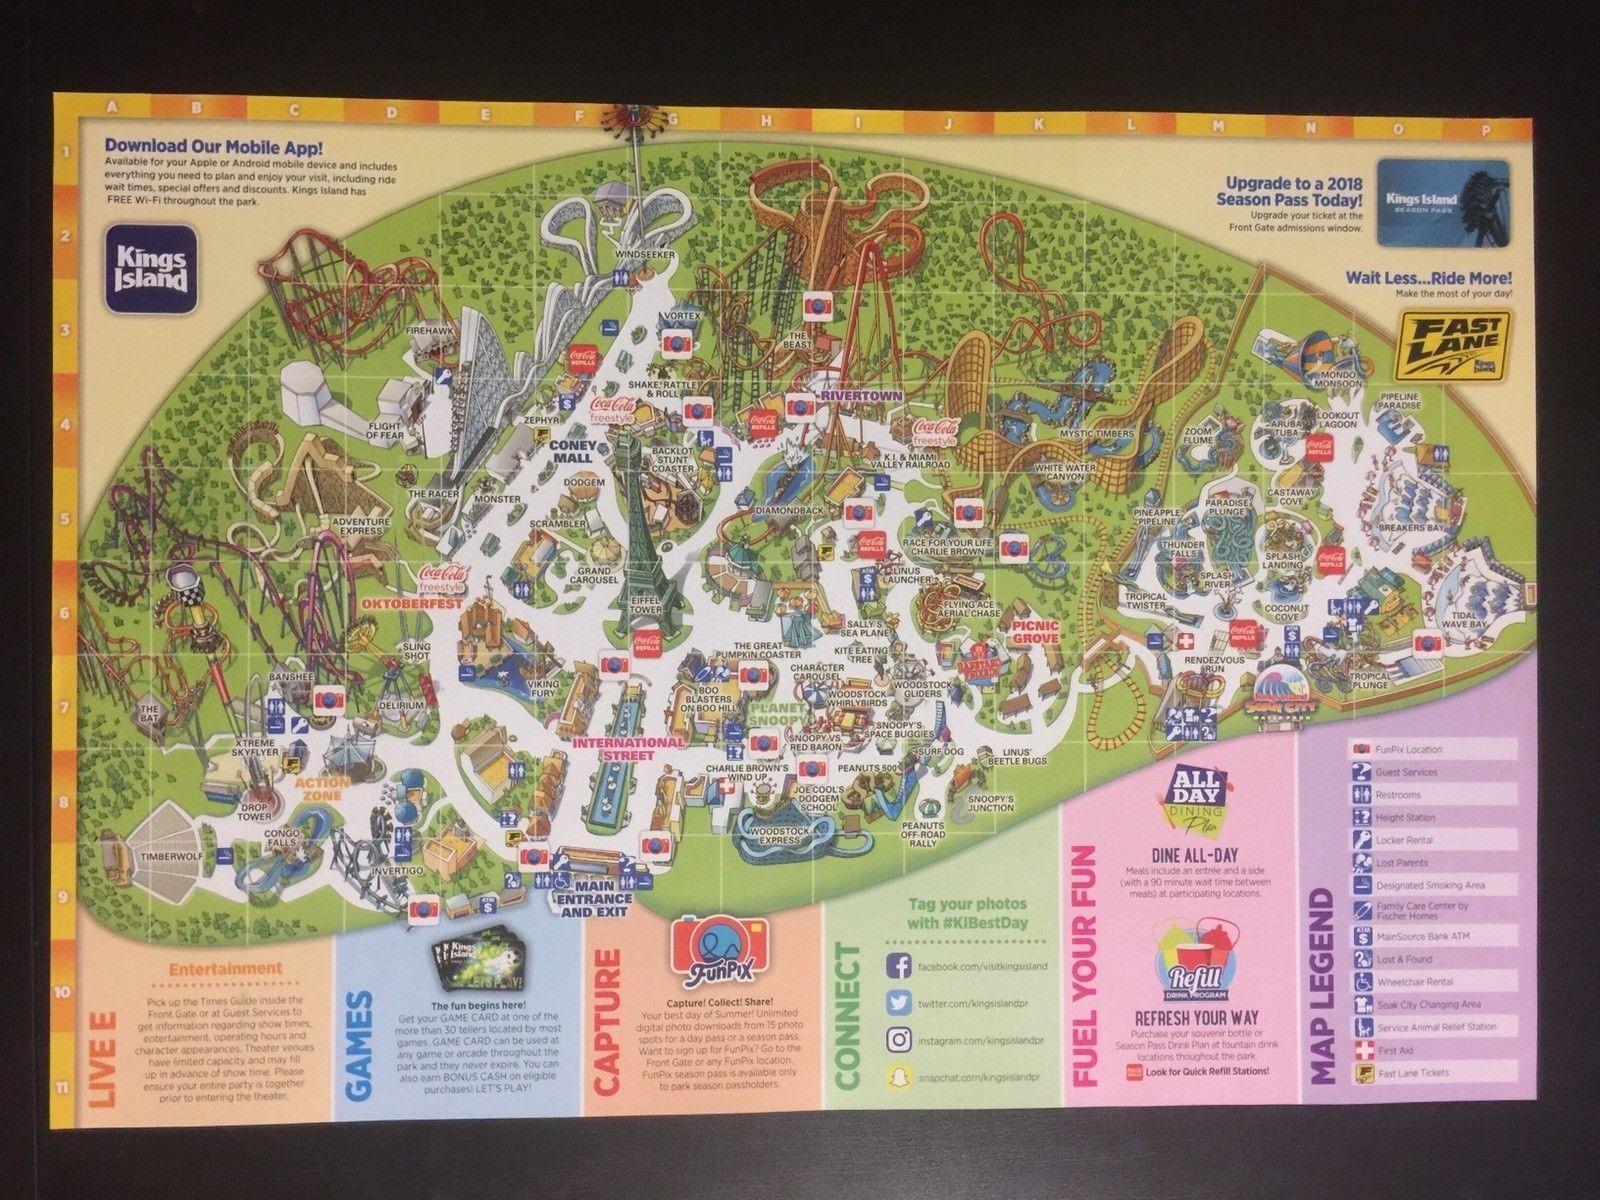 2018 Kings Island Amusement Park Map Guide Official OHIO Cincinnati - $9.99